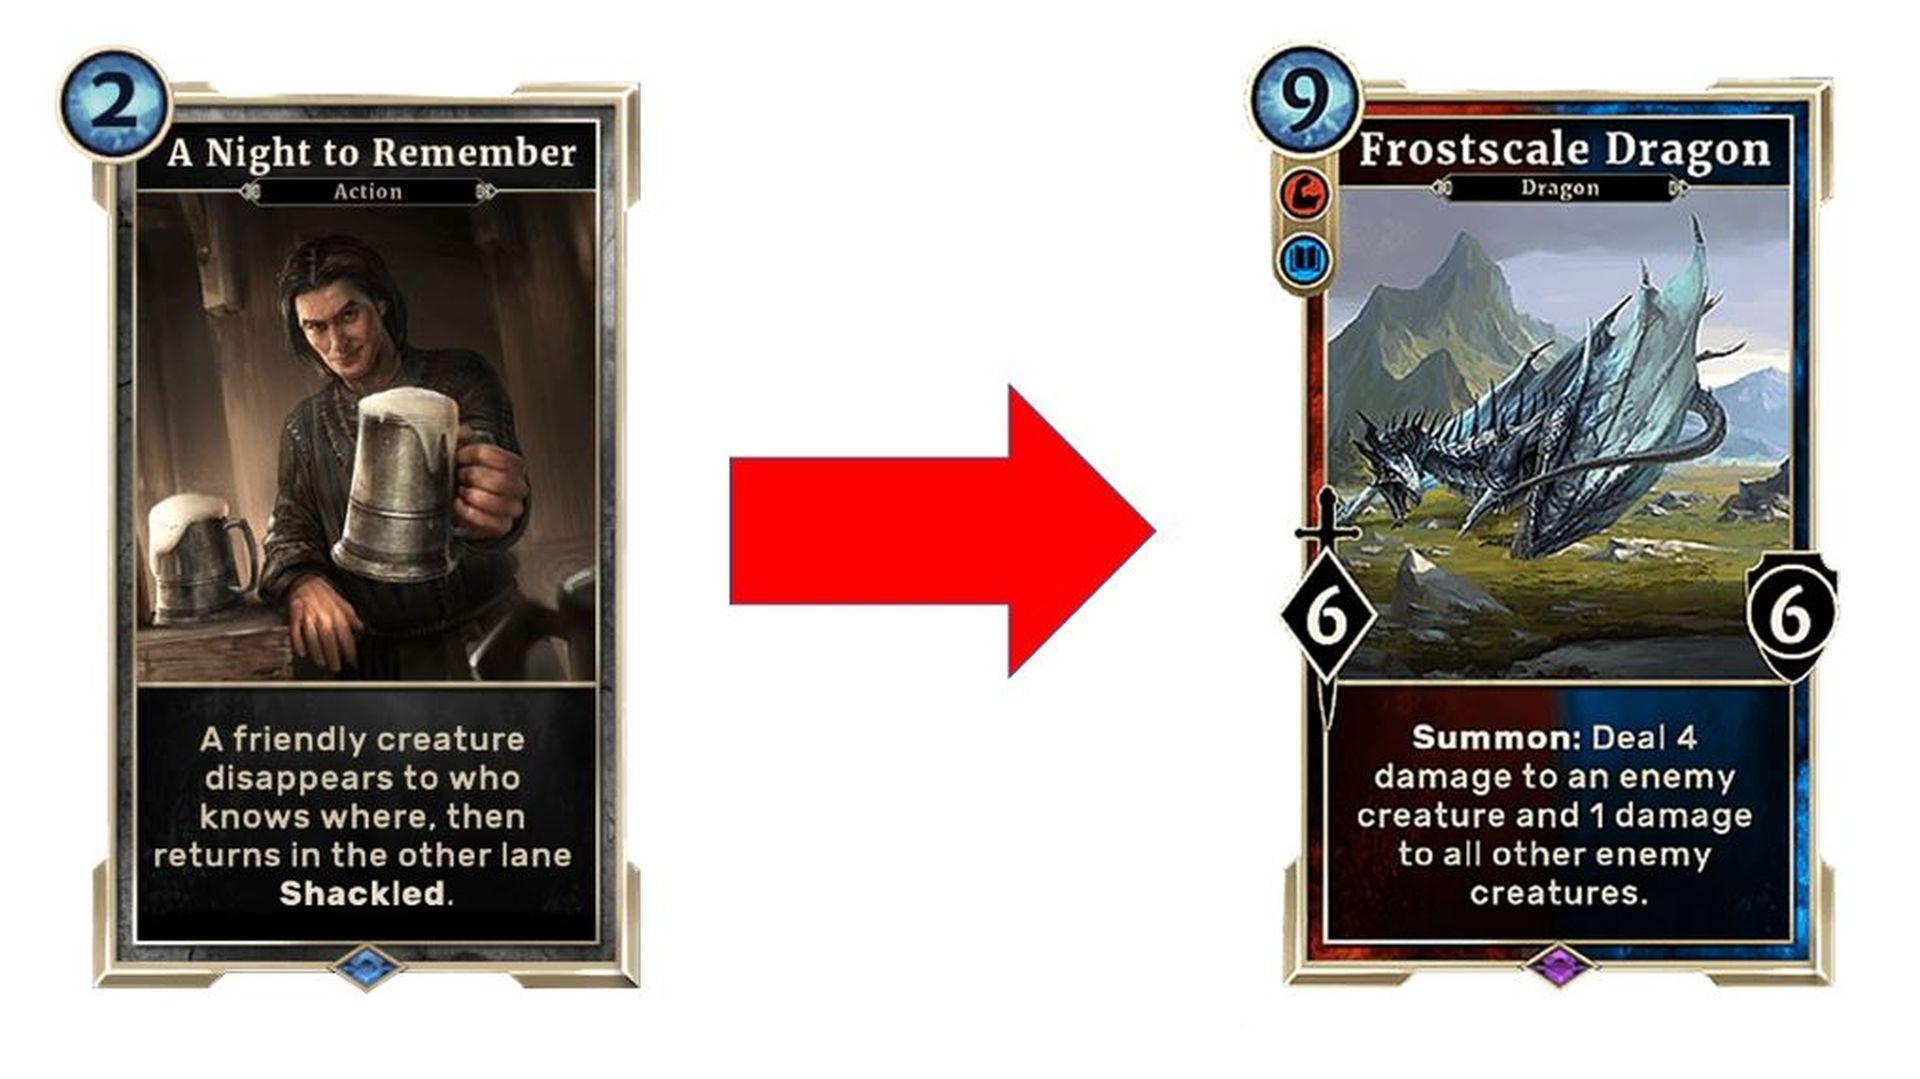 The Elder Scrolls Legends - La carta di marzo 2018